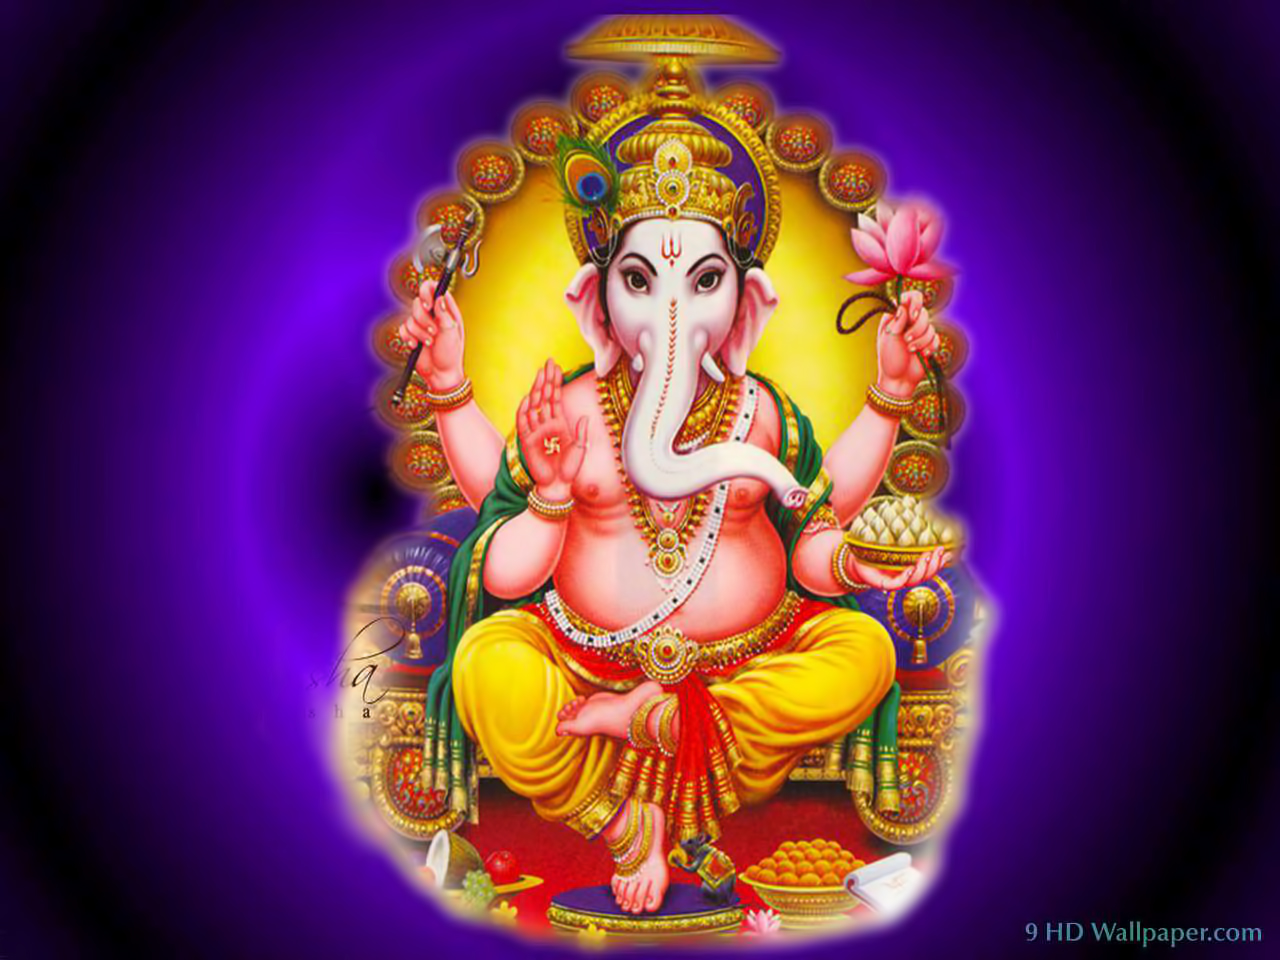 GOD HD WALLPAPERS: High Quality Lord Ganesh Wallpaper